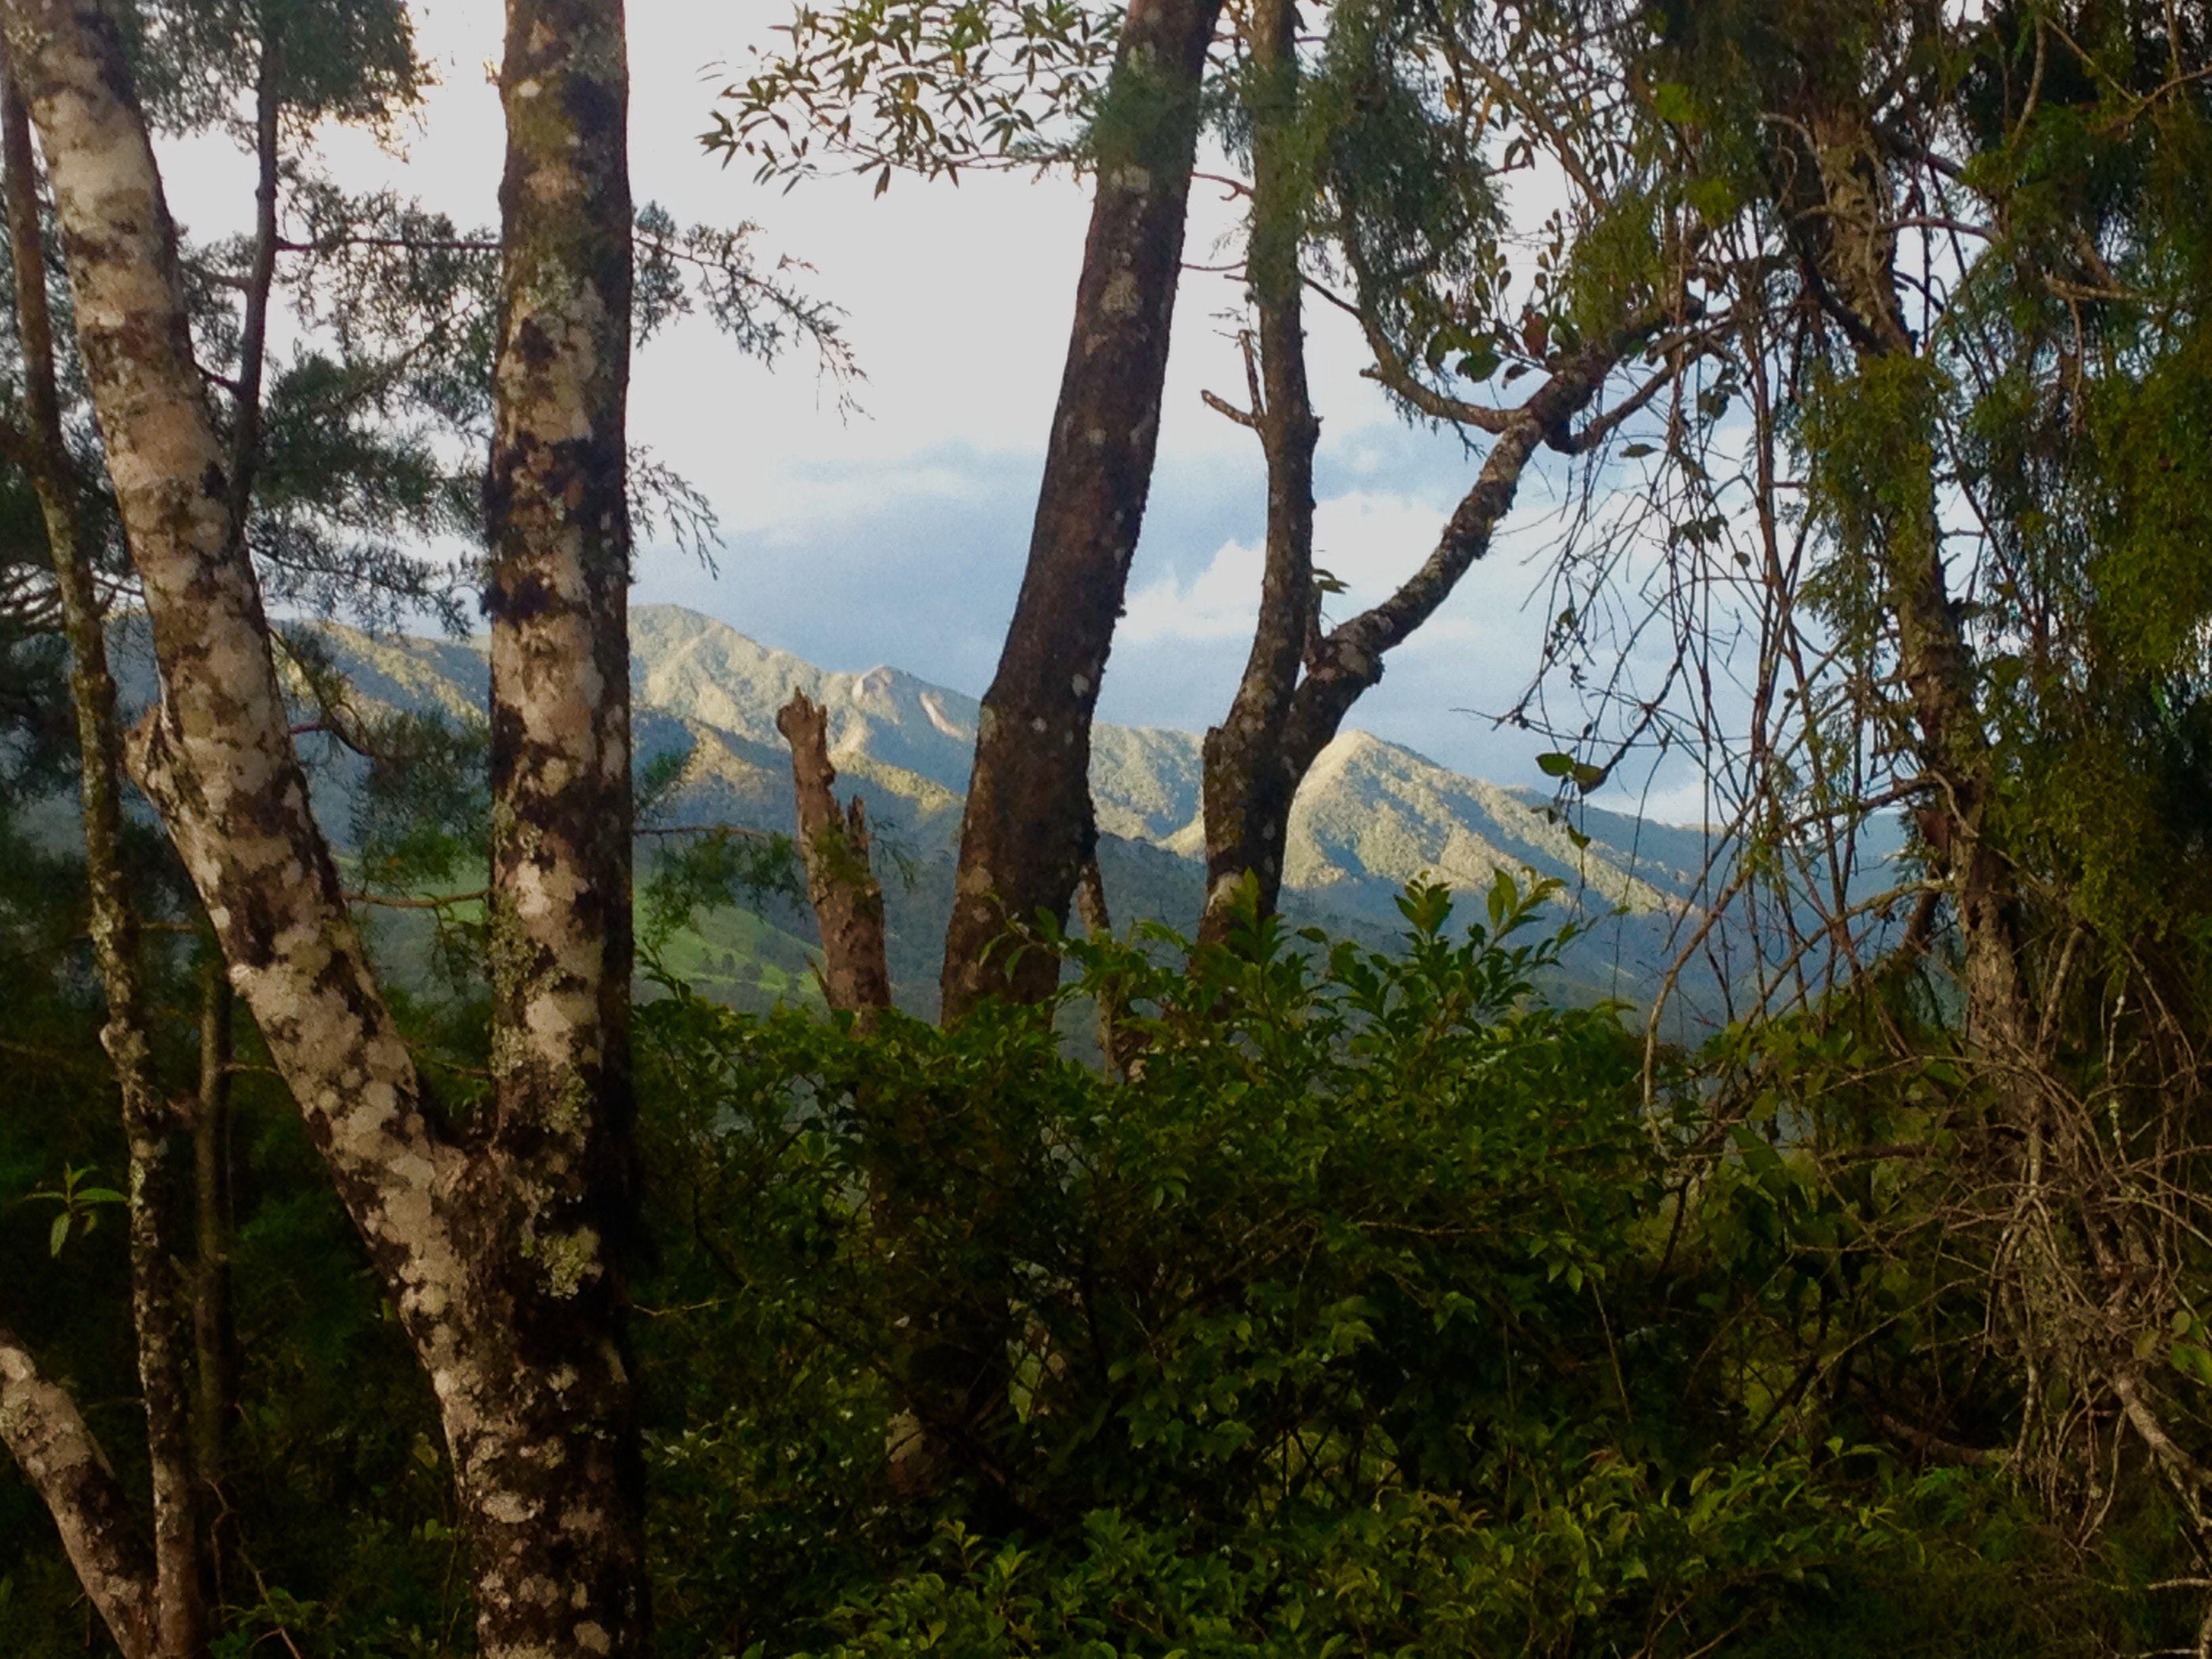 Visconde de Mauá / RJ (Foto: Daniel Salvador)